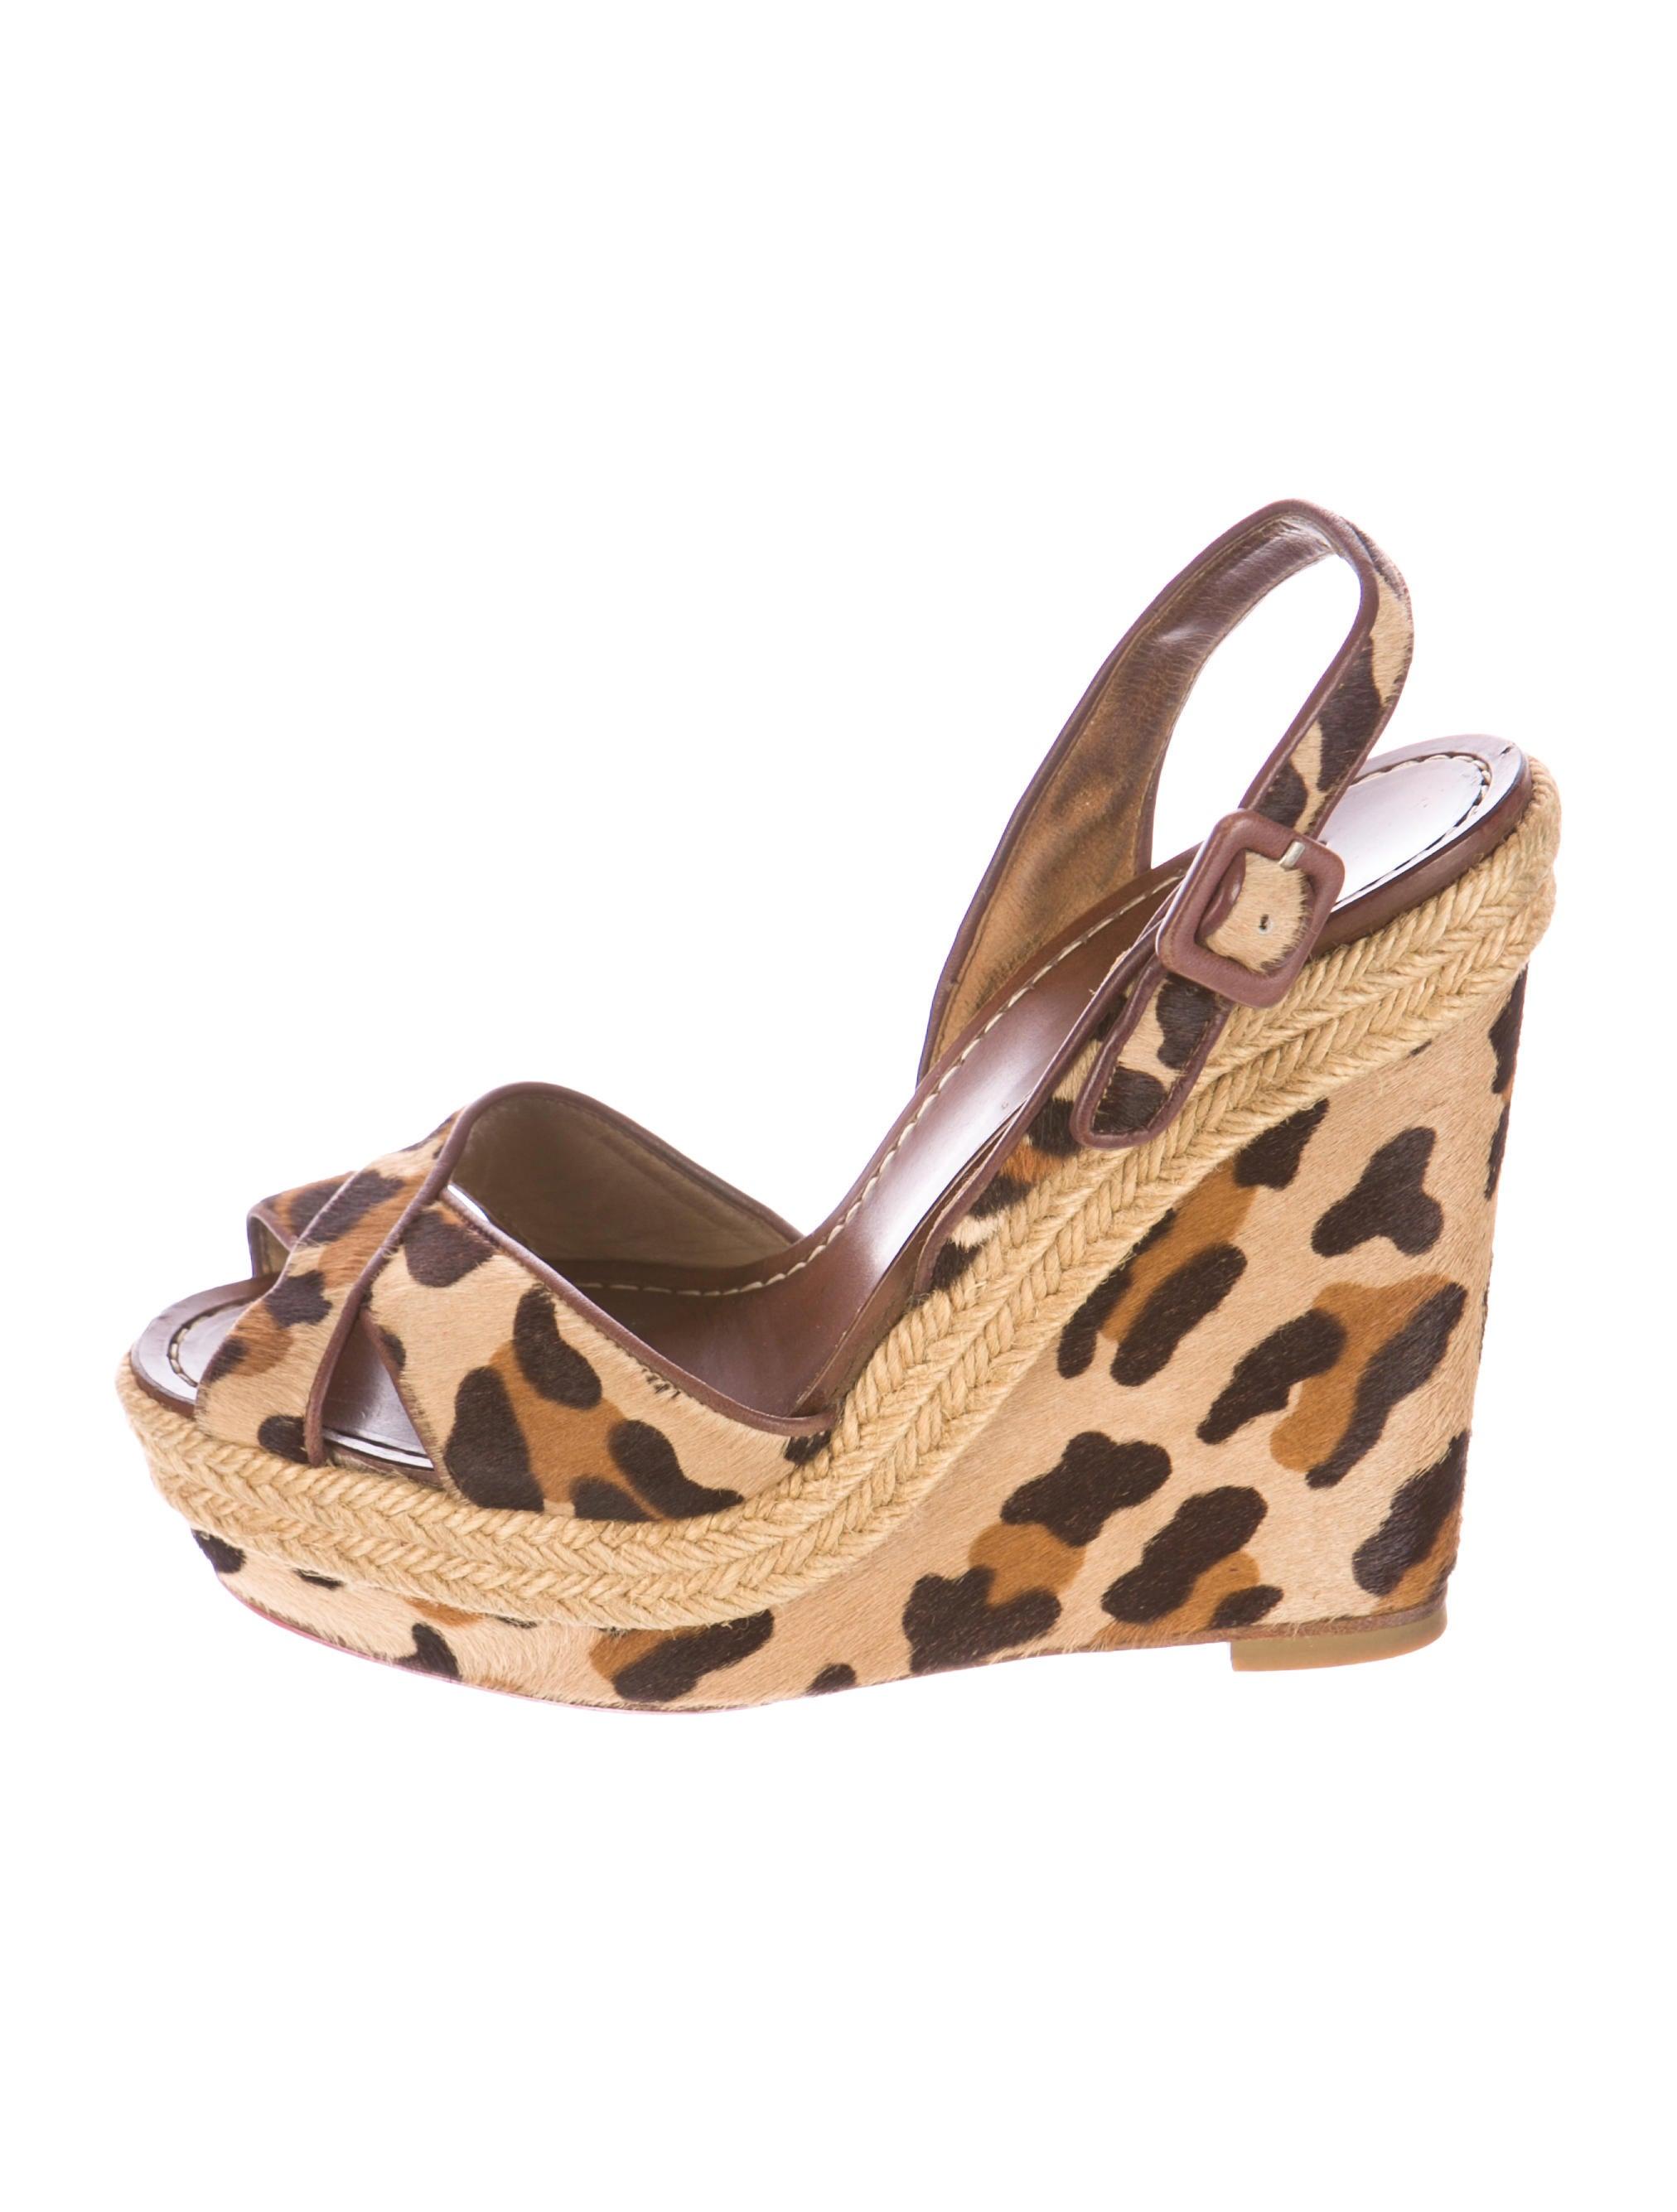 replica mens dress shoes - Artesur ? christian louboutin wedge sandals Tan ponyhair leopard print